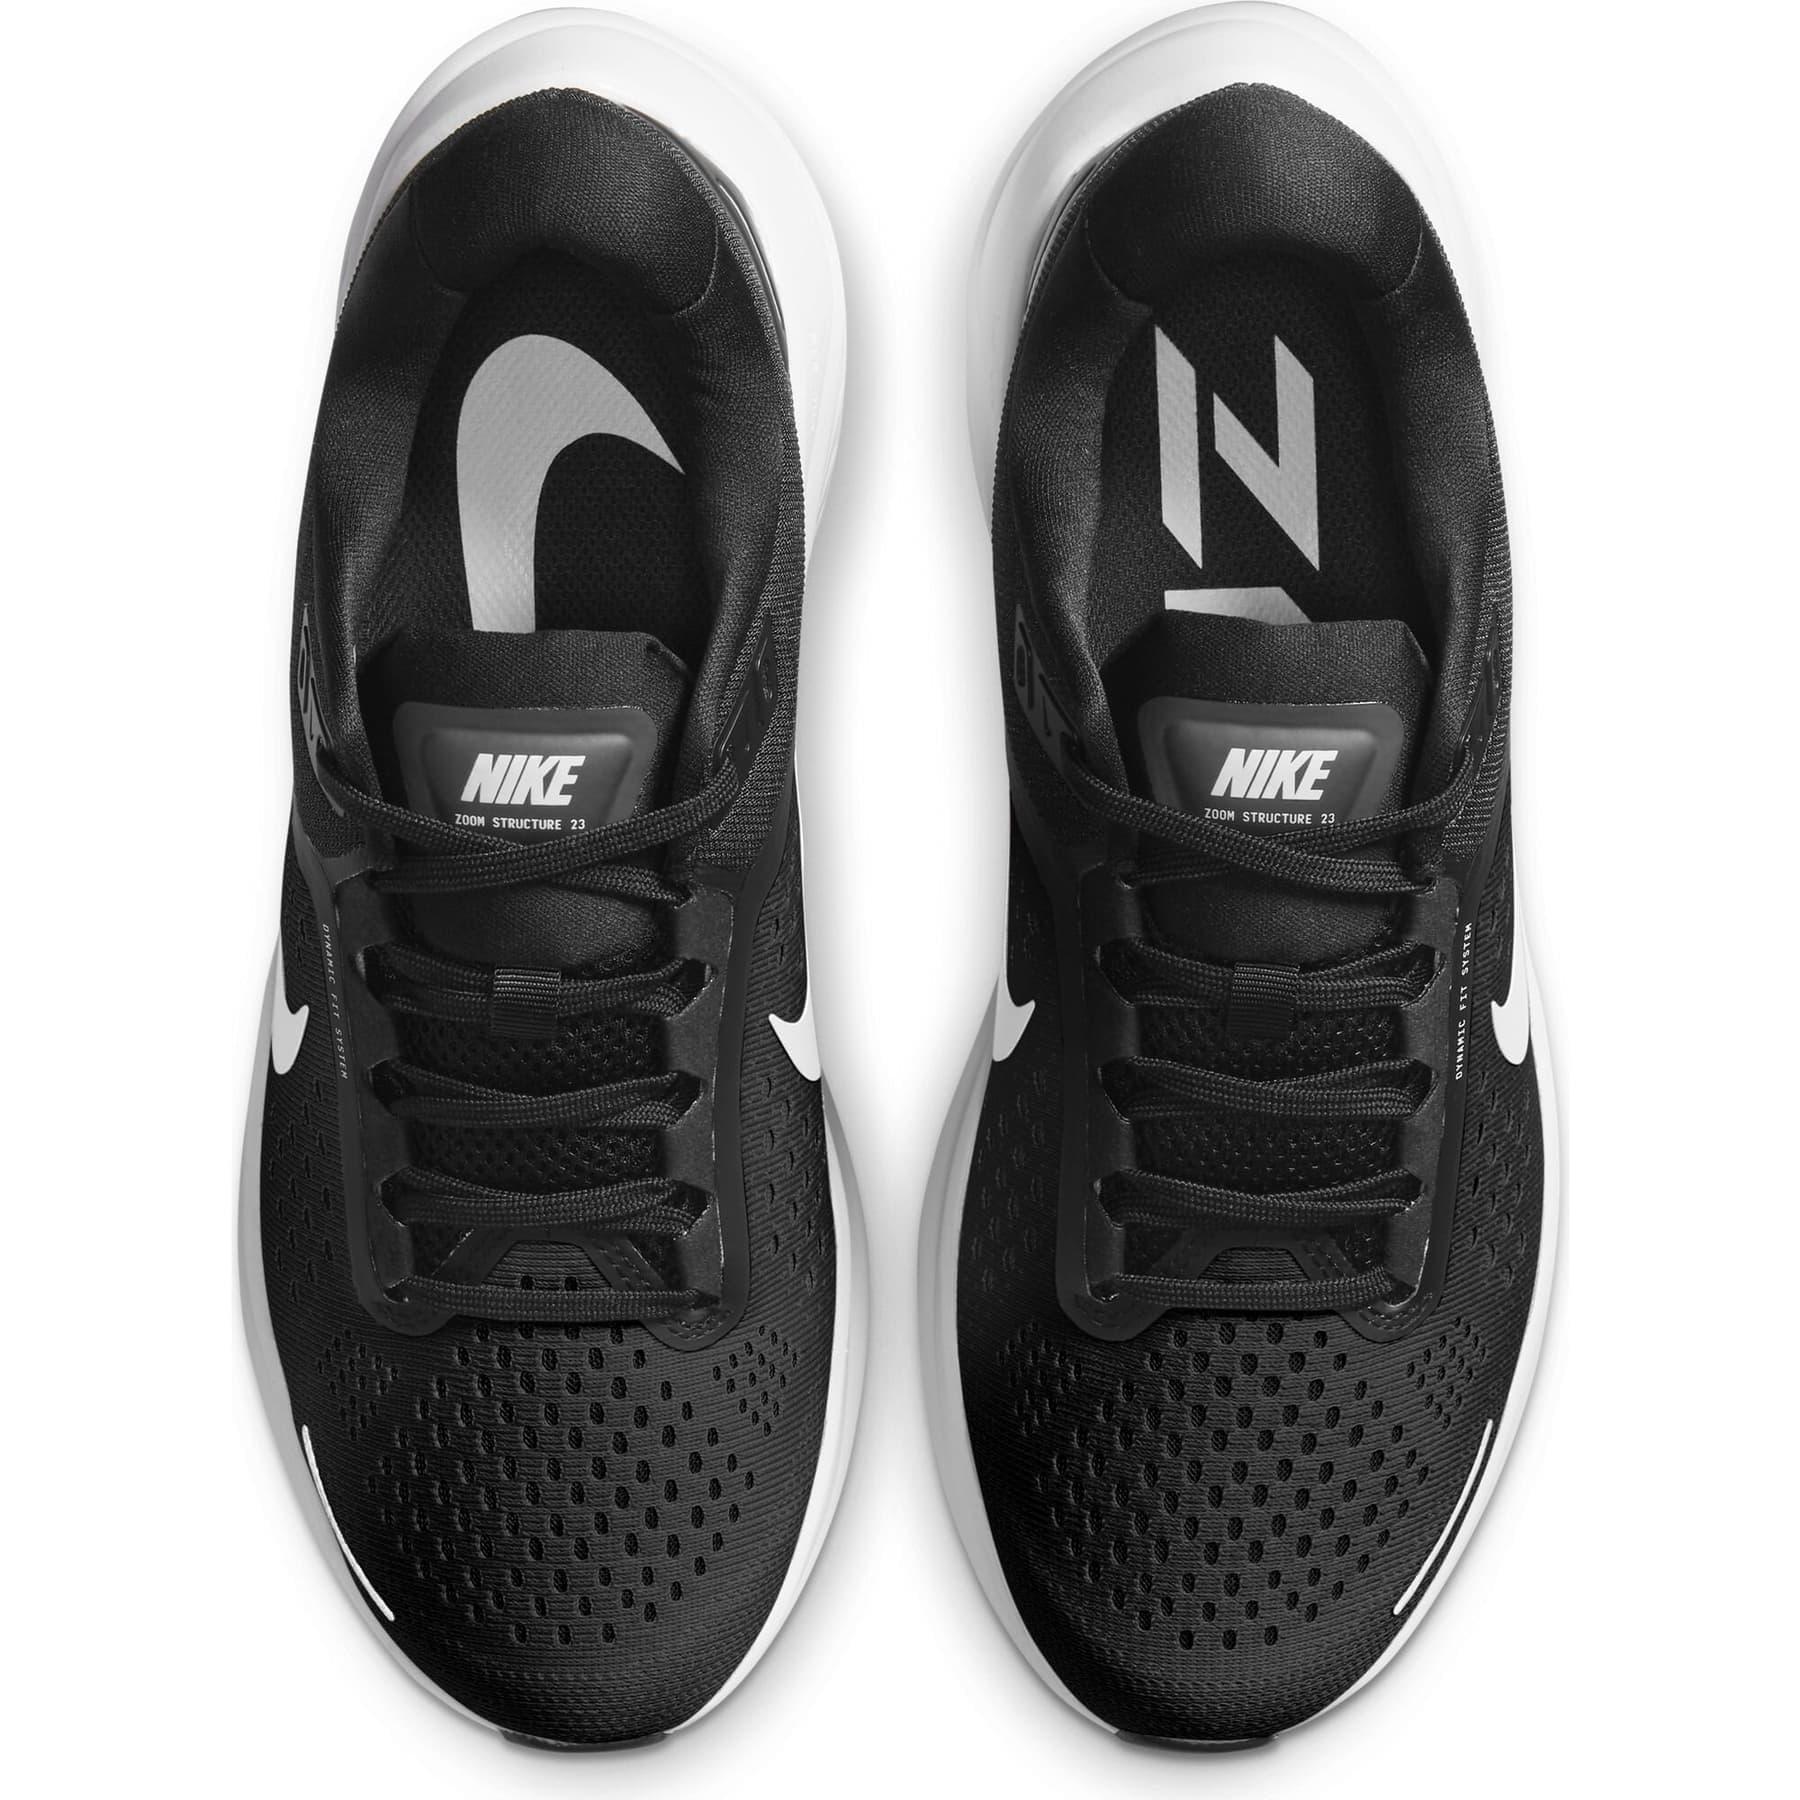 Air Zoom Structure 23 Kadın Siyah Koşu Ayakkabısı (CZ6721-001)